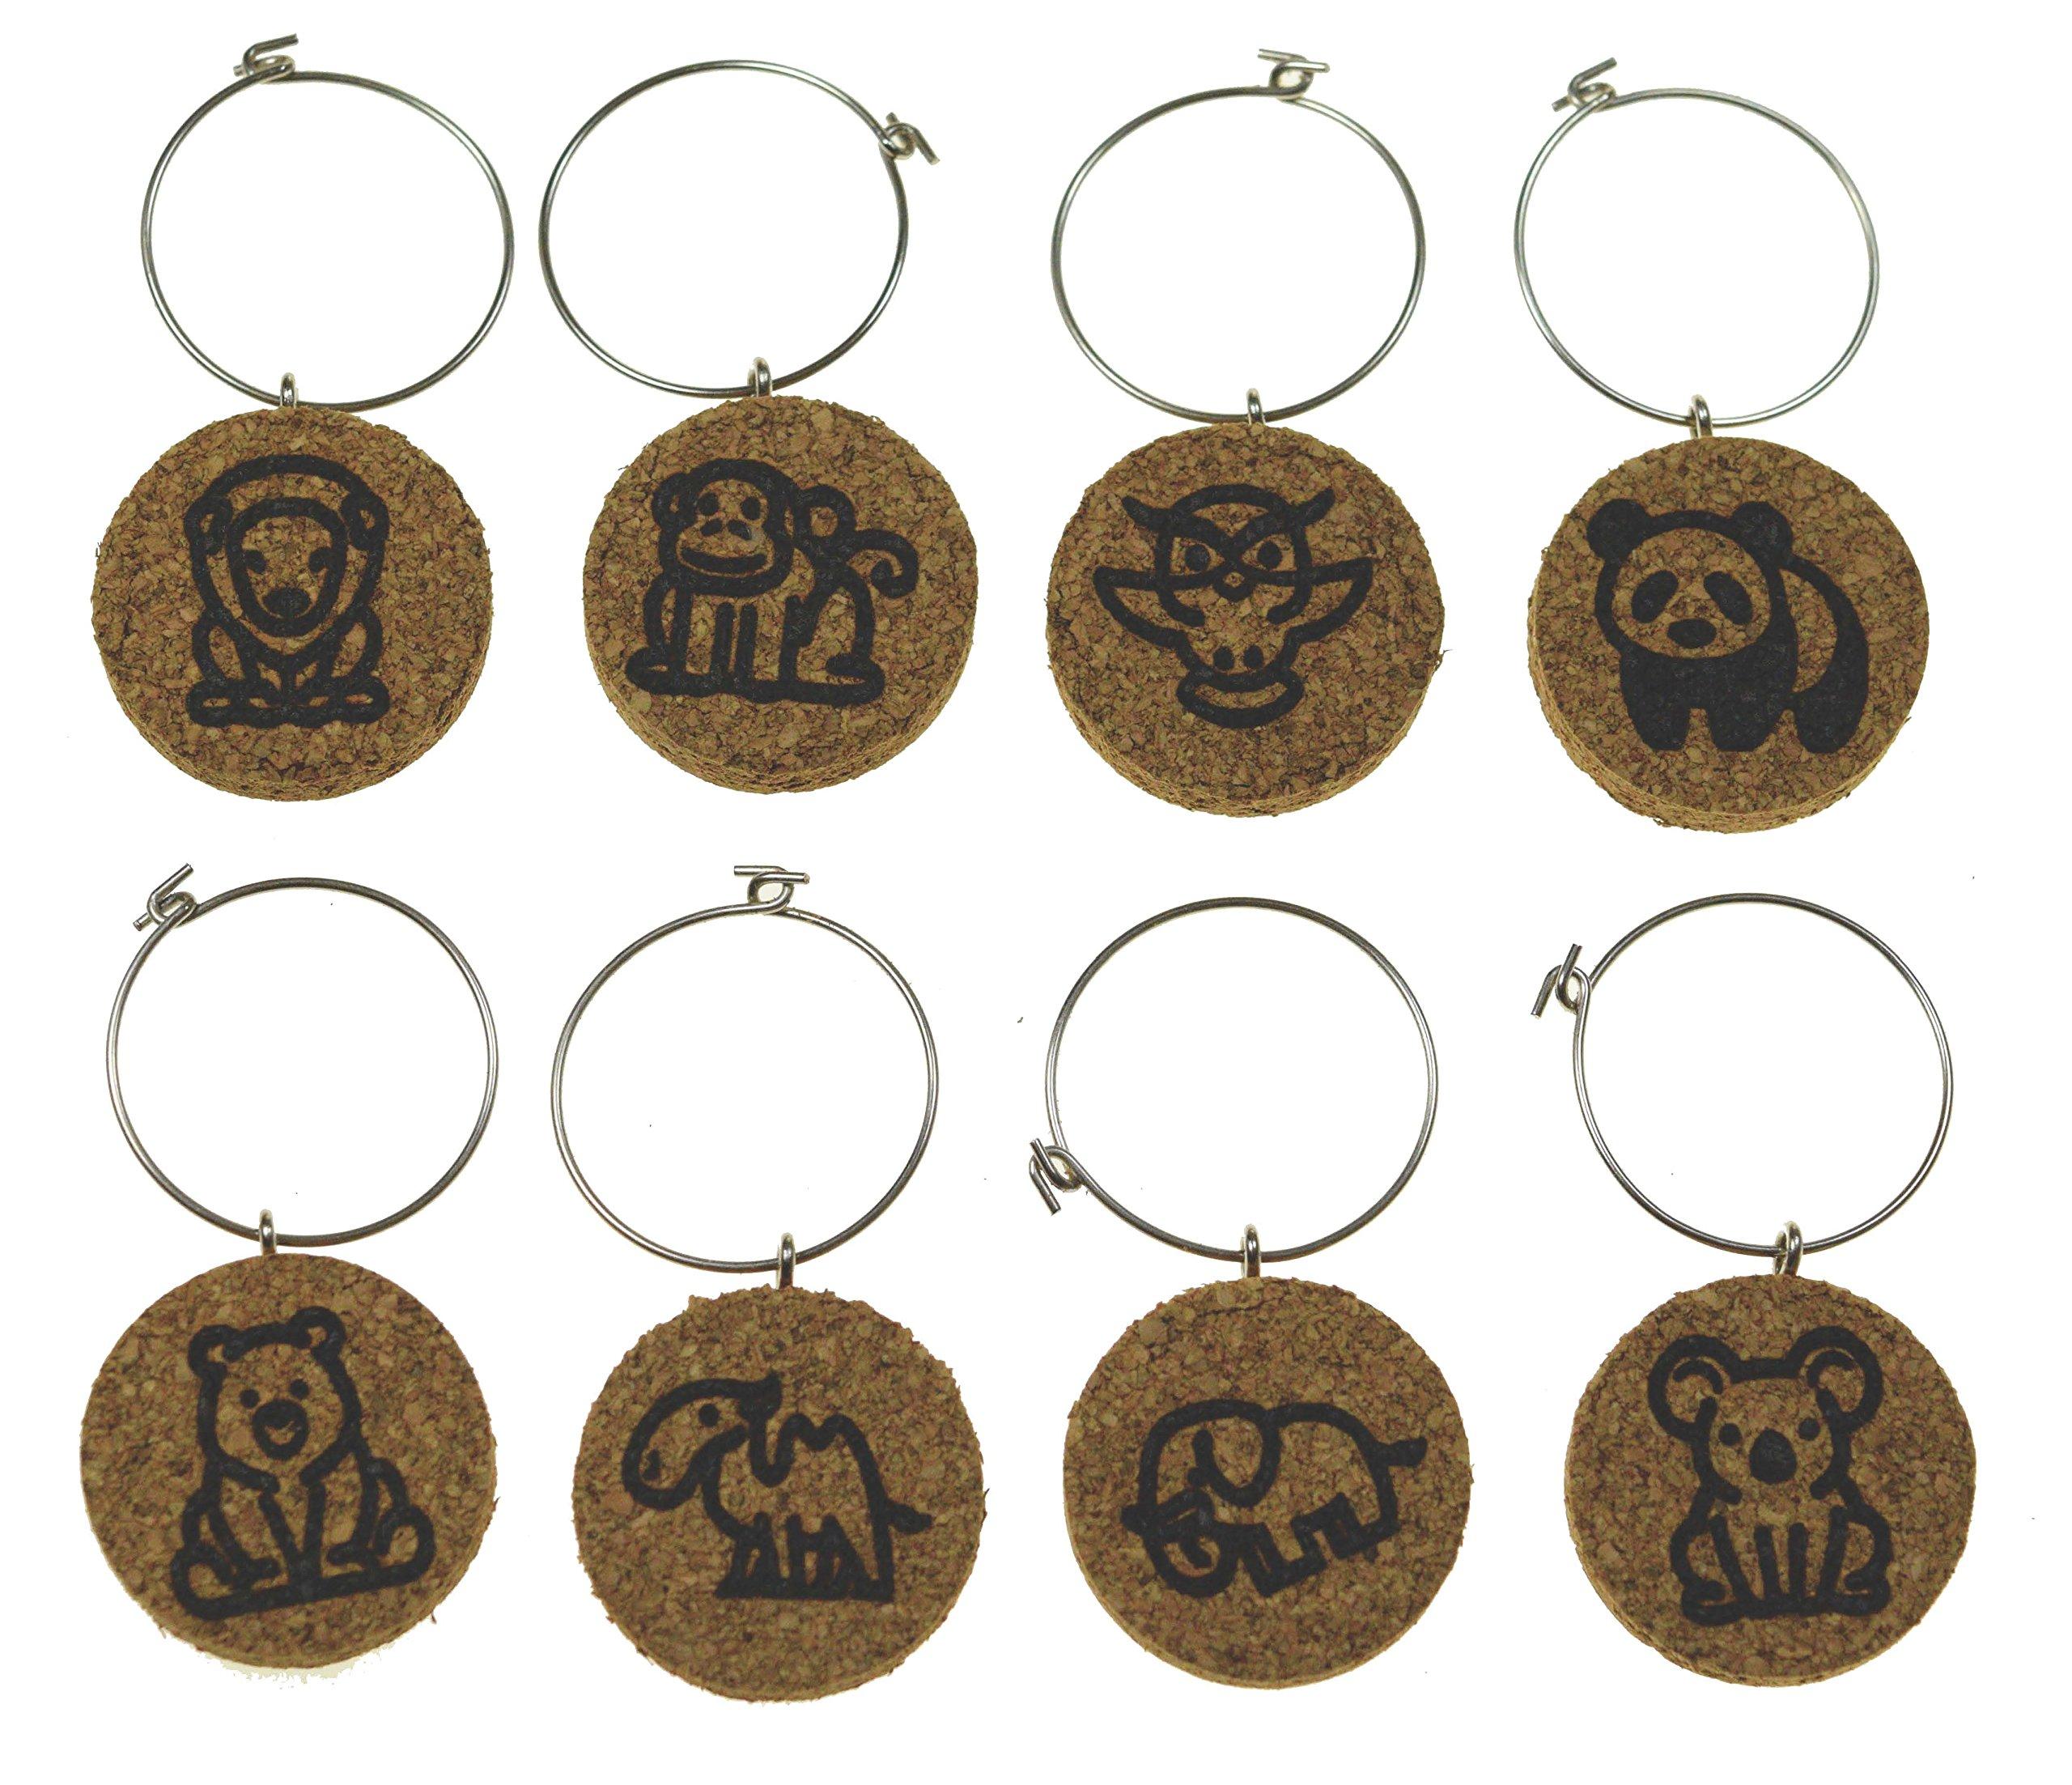 Cork Wine Glass Charms (20+ Unique Designs) - Set of 8 - Zoo Animal Designs: Lion, Monkey, Owl, Panda, Bear, Camel, Elephant, Koala - Tags to Mark Your Drink (Zoo Animals)